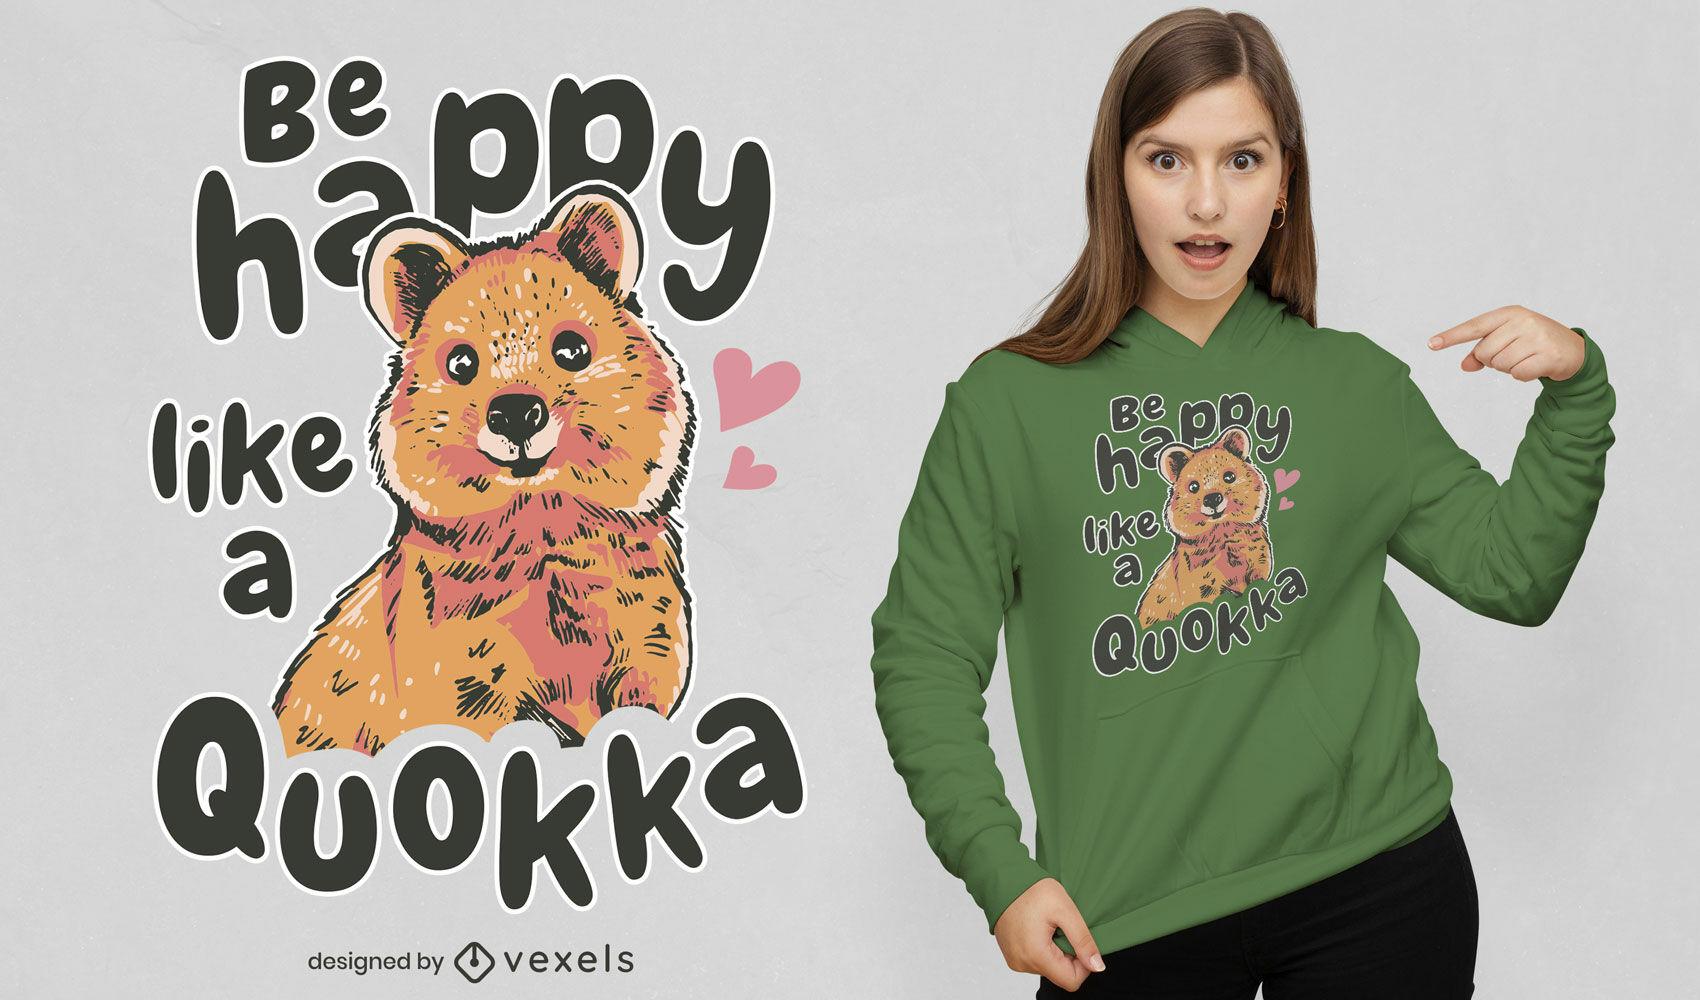 Cute happy quokka t-shirt design